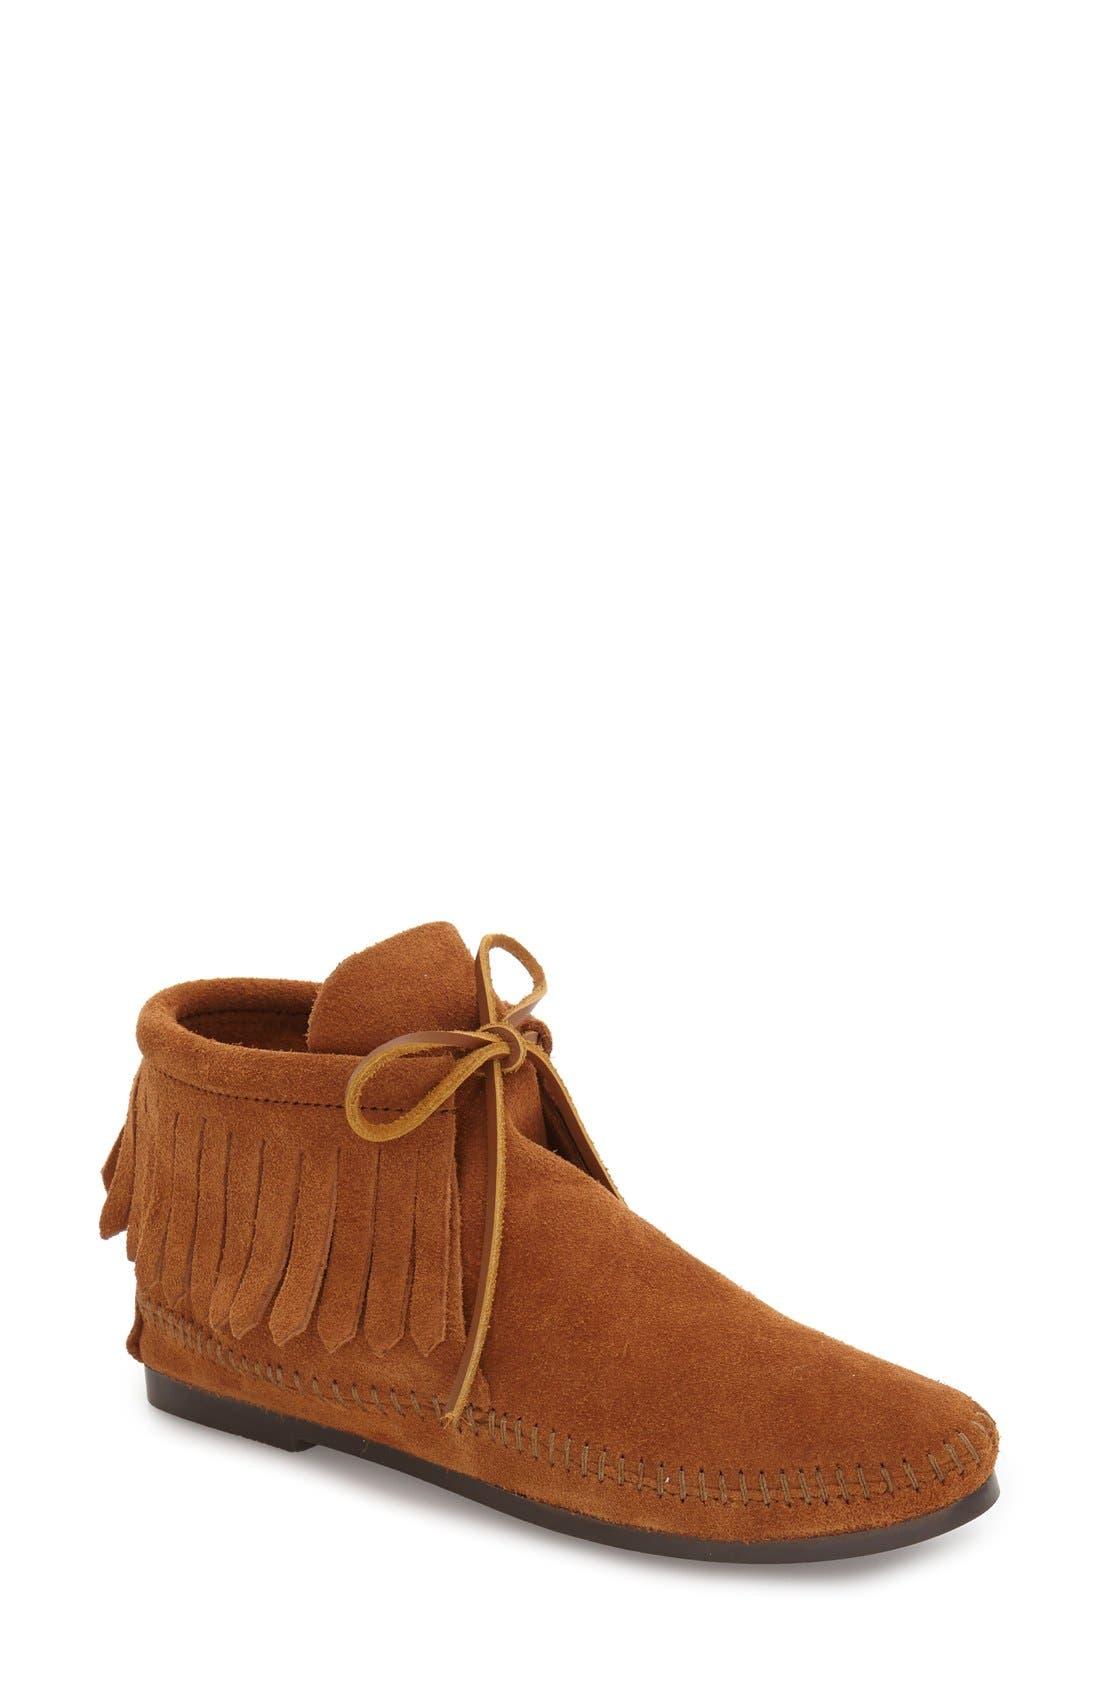 MINNETONKA Classic Fringed Chukka Style Boot, Main, color, BROWN